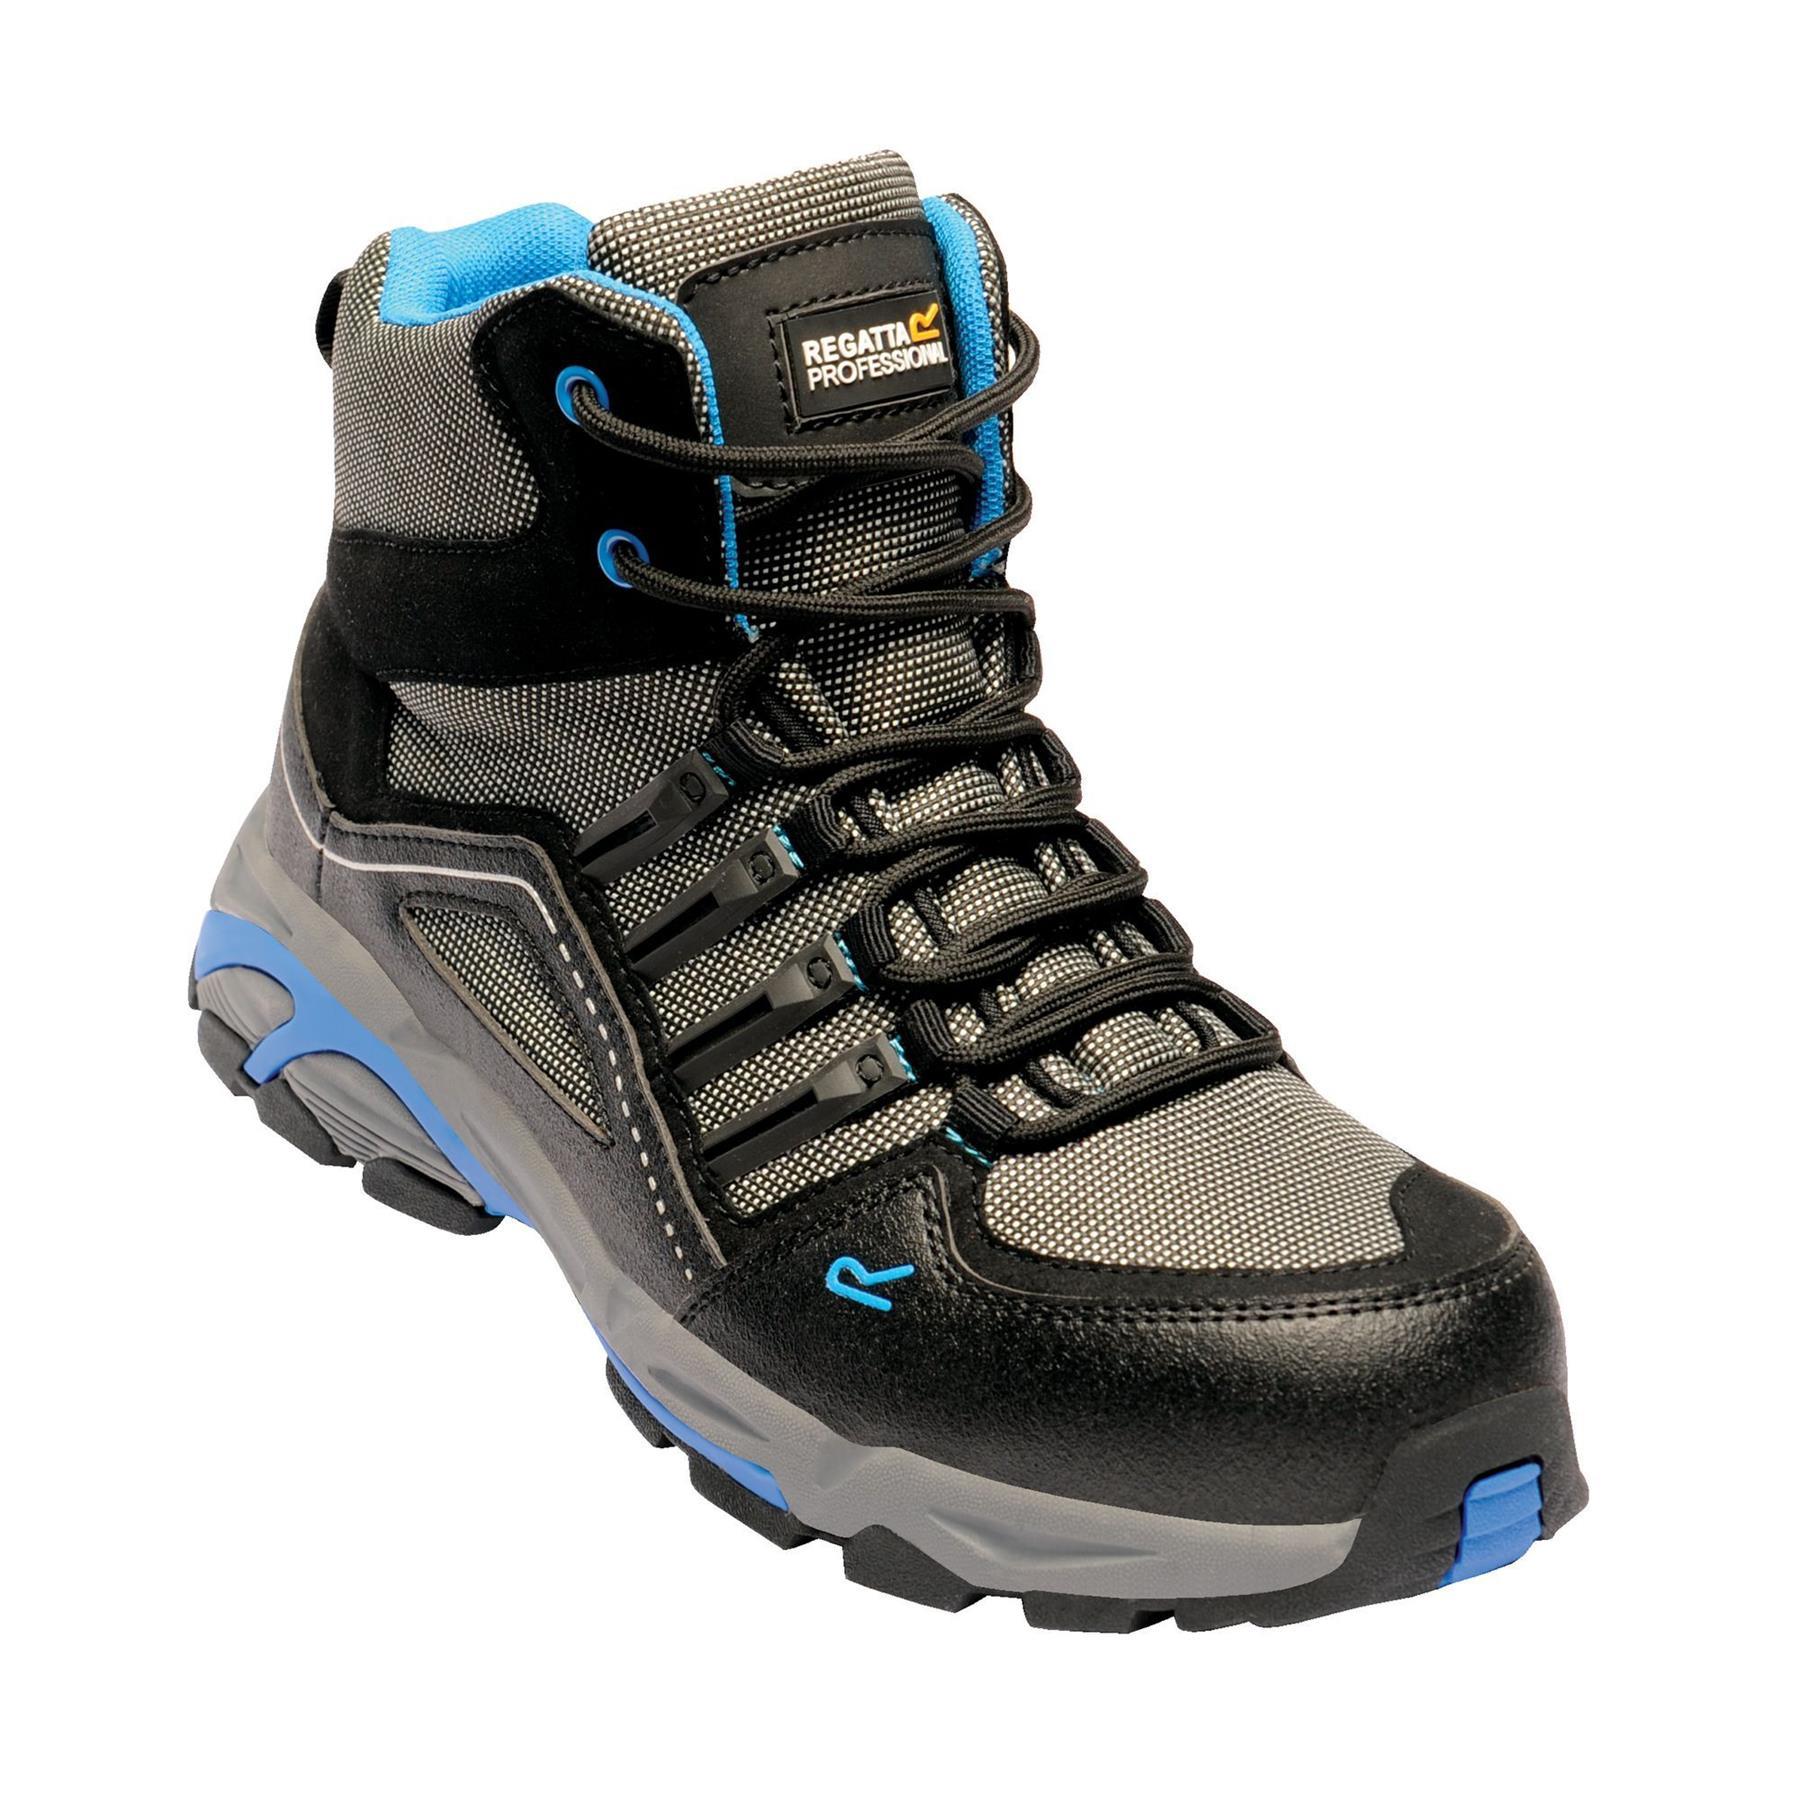 miniatuur 3 - Regatta Mens Work Safety Protective Shoes Steel Toe Cap Boots Workwear